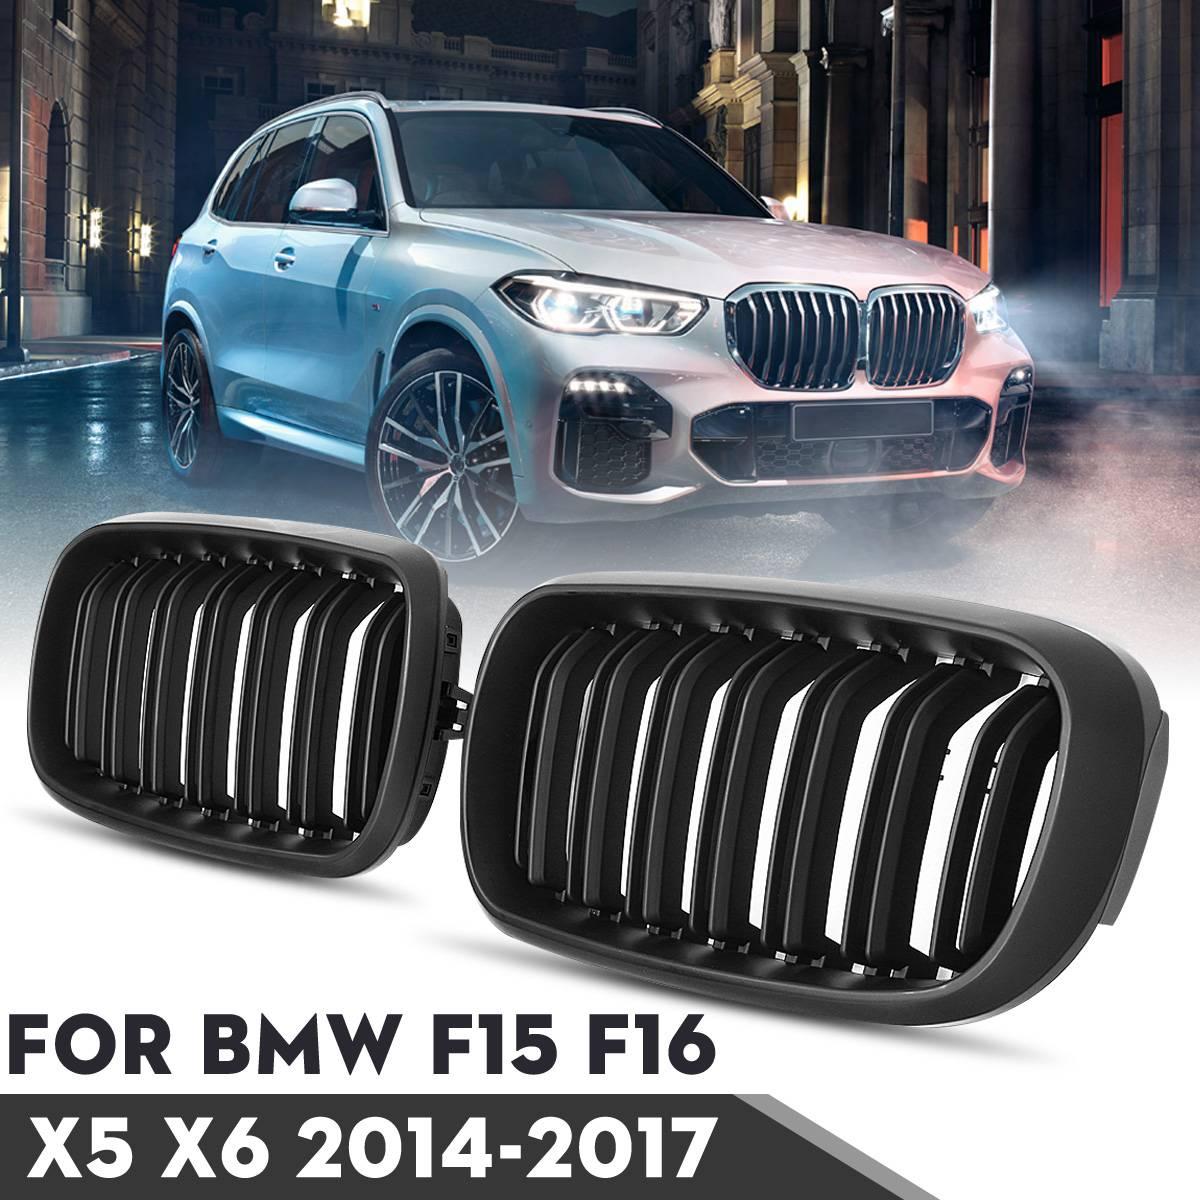 1 çift araba parlak/mat siyah ön tampon çift 2 çıta böbrek için BMW F15 F16 X5 X6 f85 F86 X5M X6M 2014-2017 ızgaraları